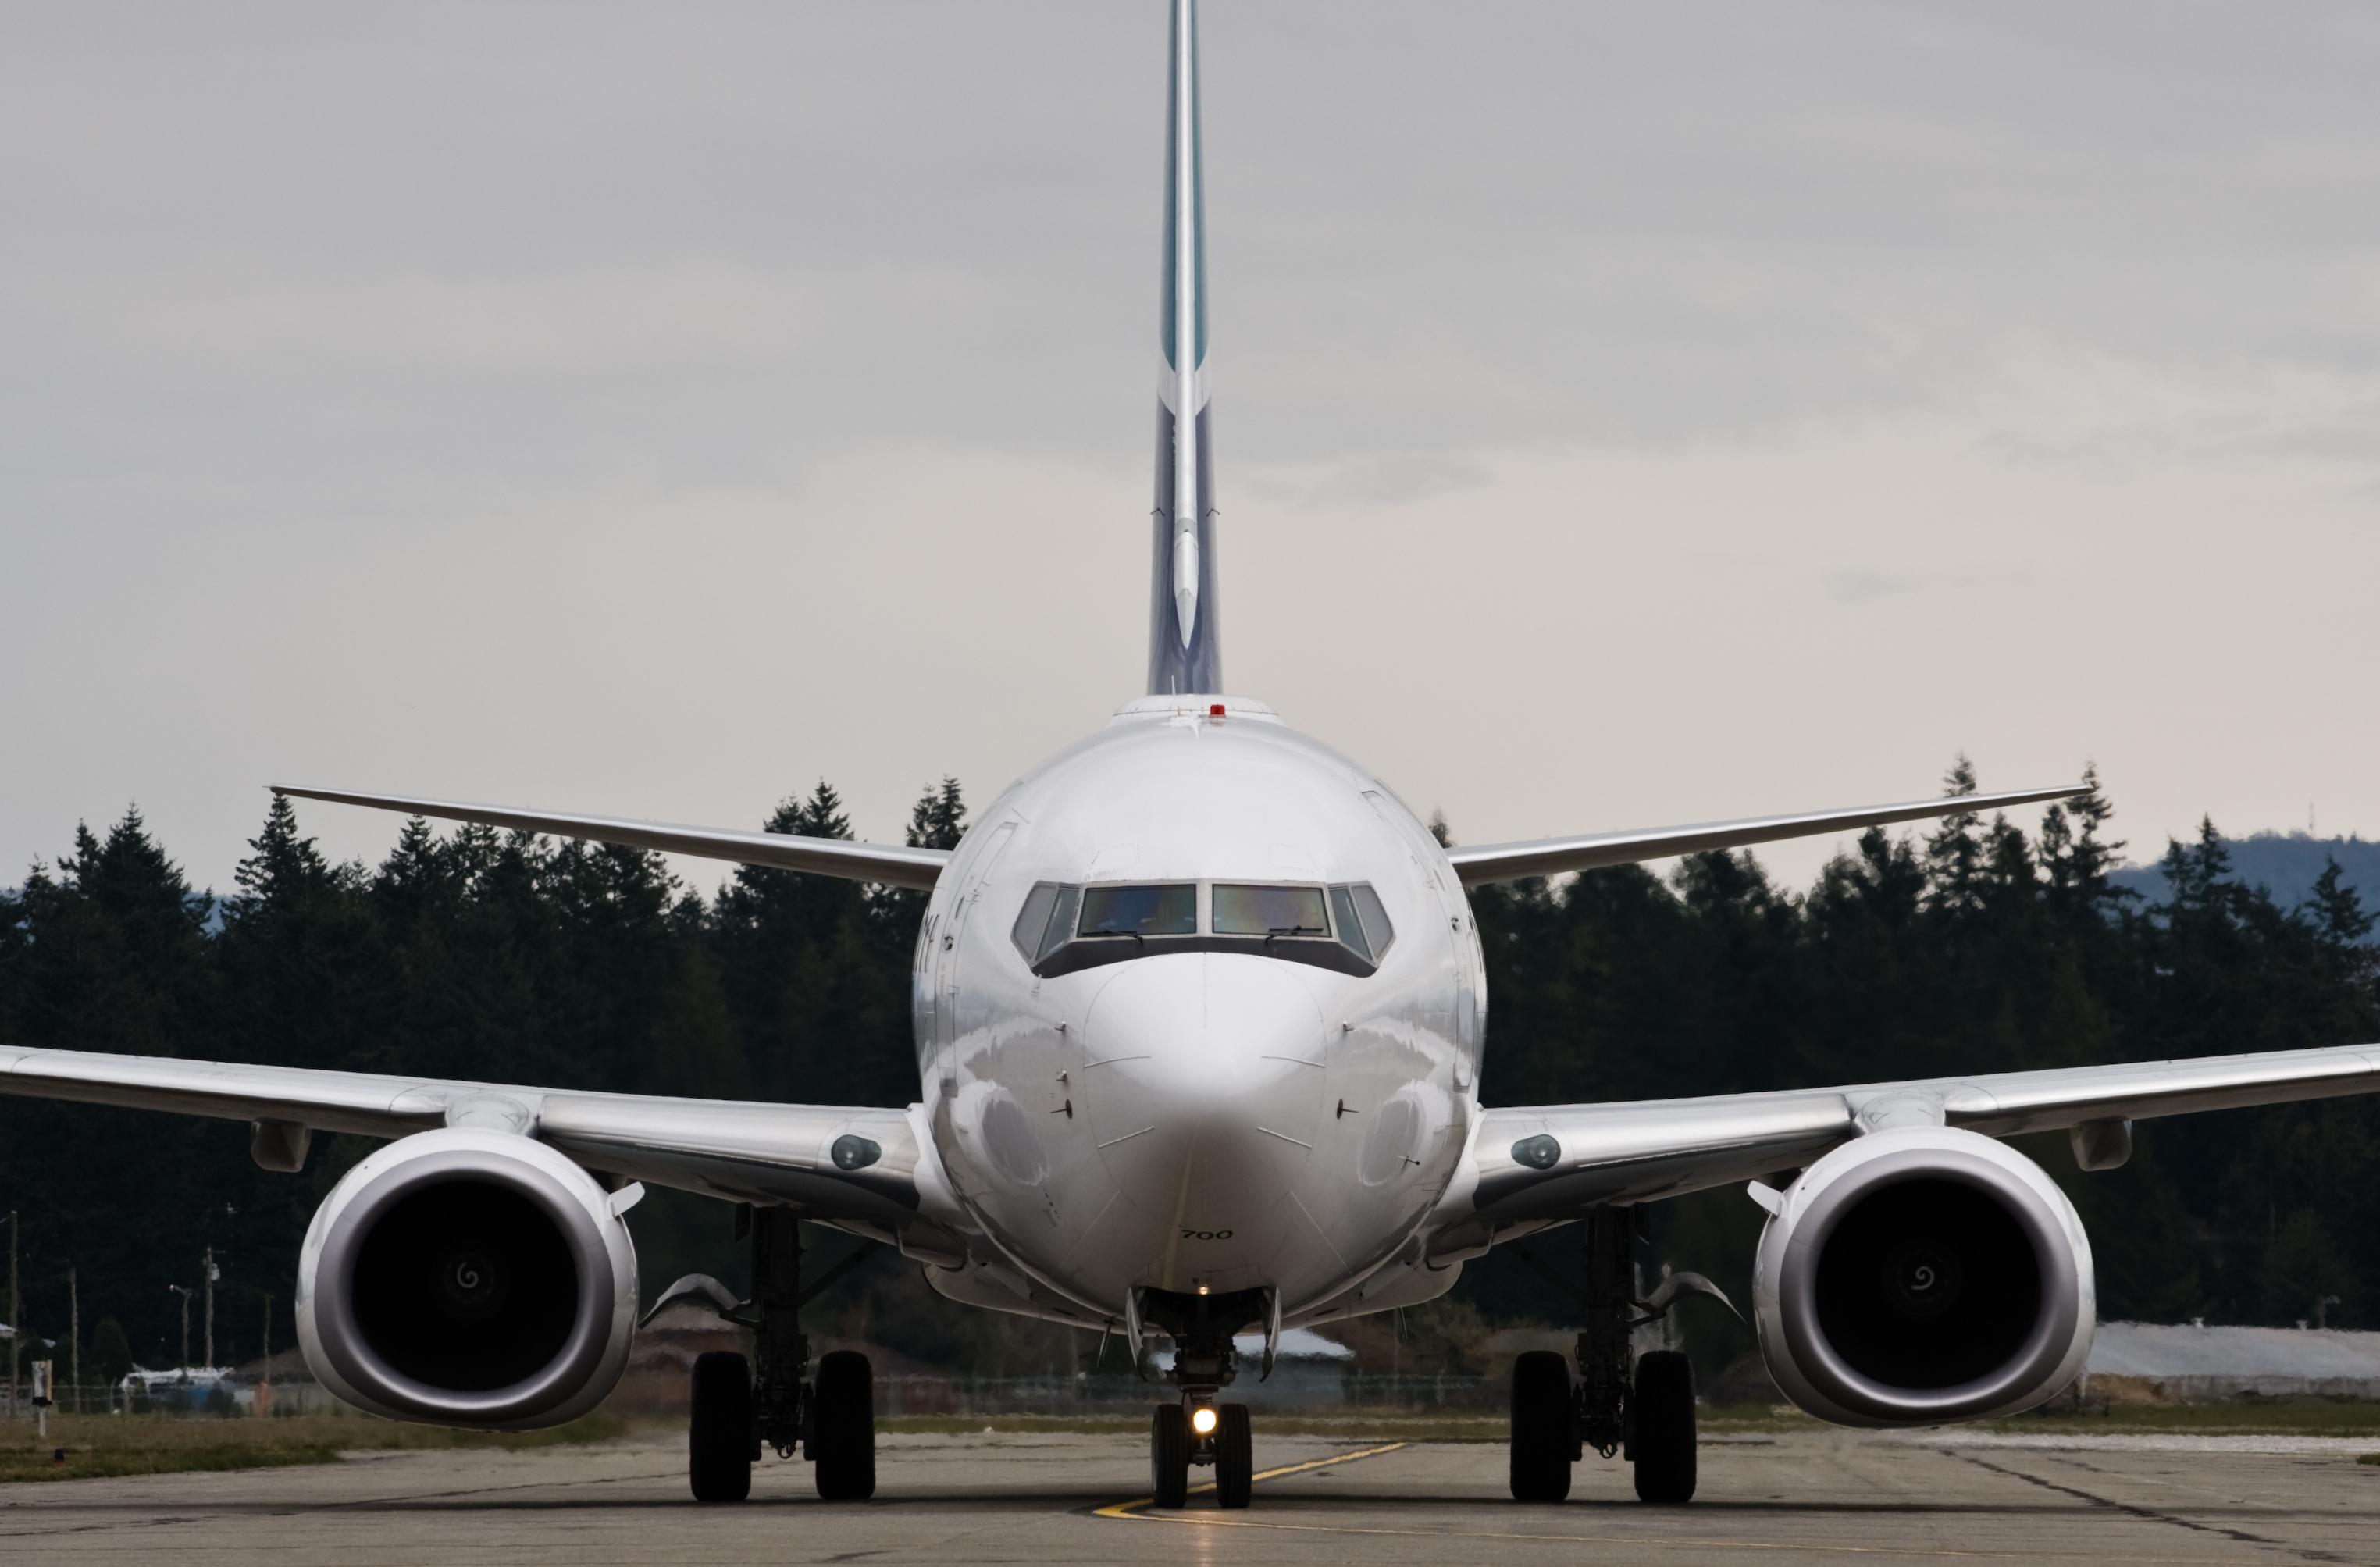 Boeing 737 head on